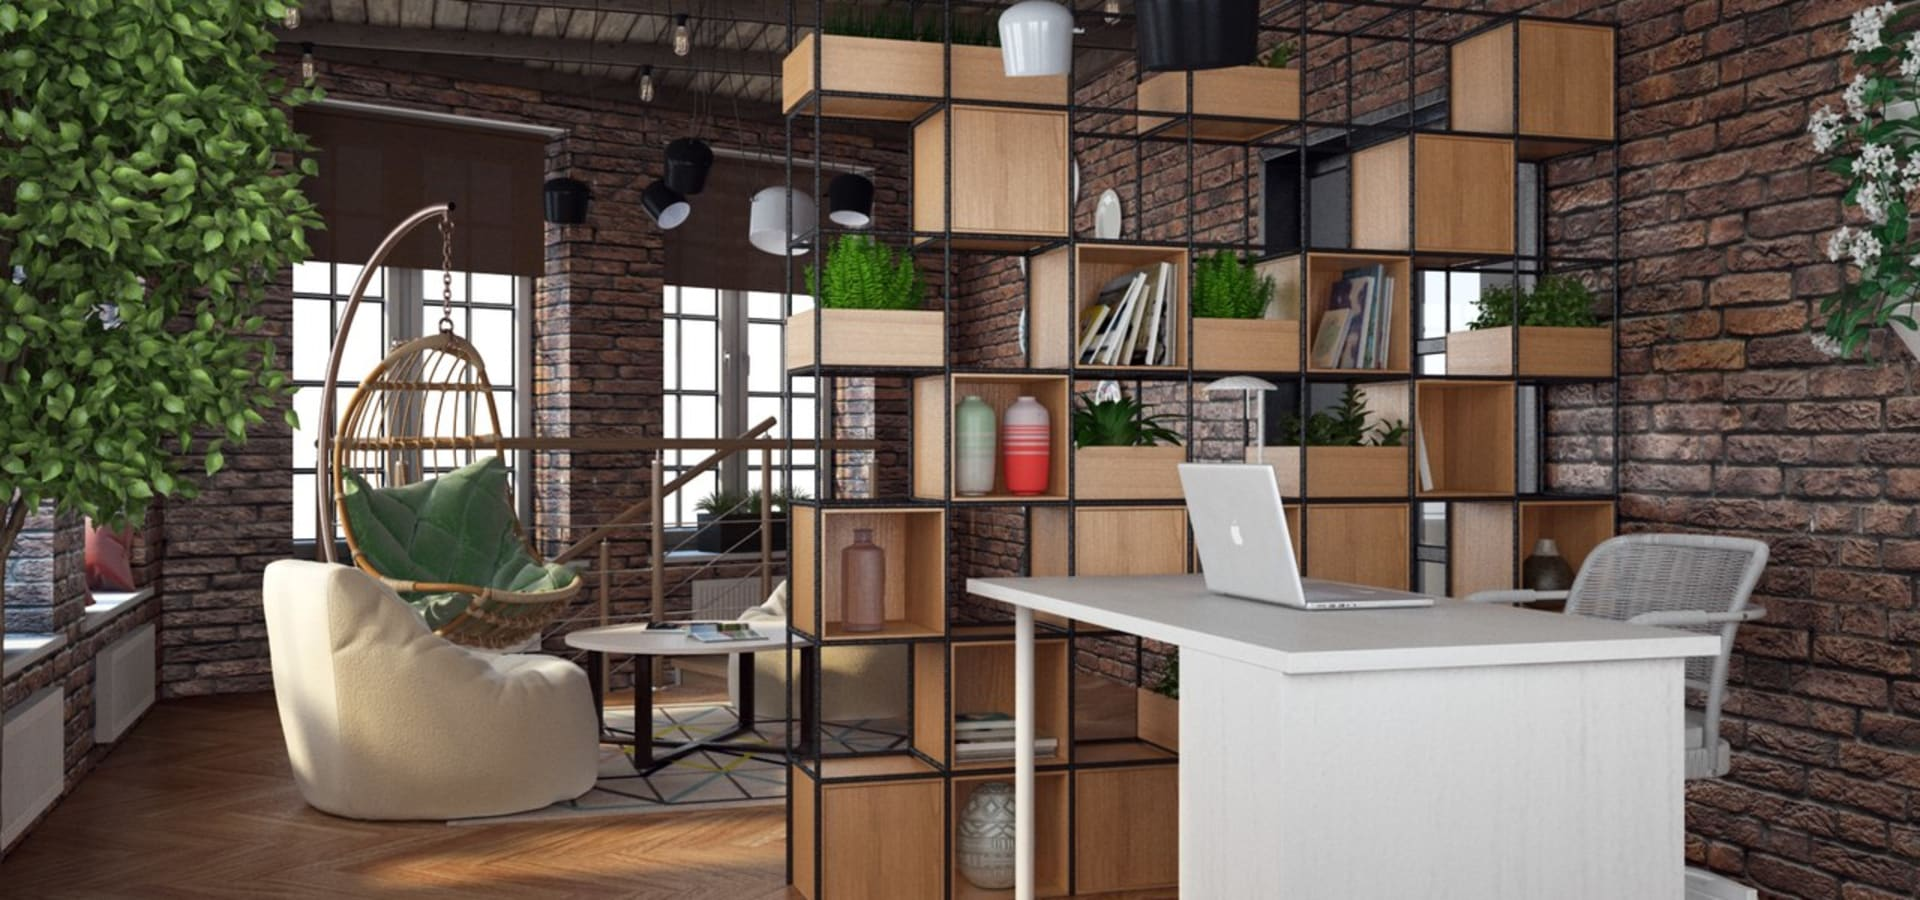 Anastasia Yakovleva design studio